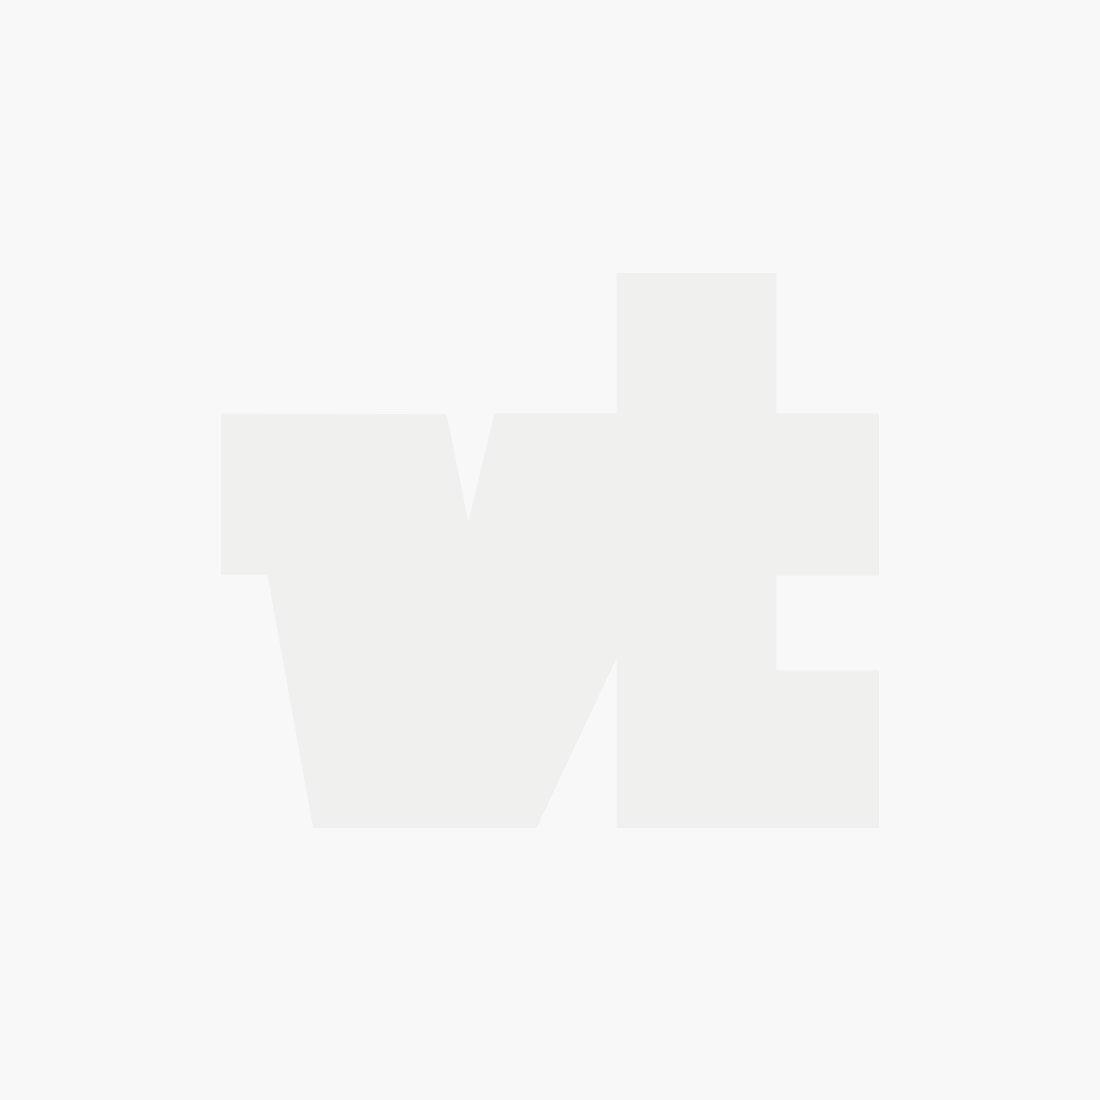 Eva corduroy flare trousers - 32l/34l